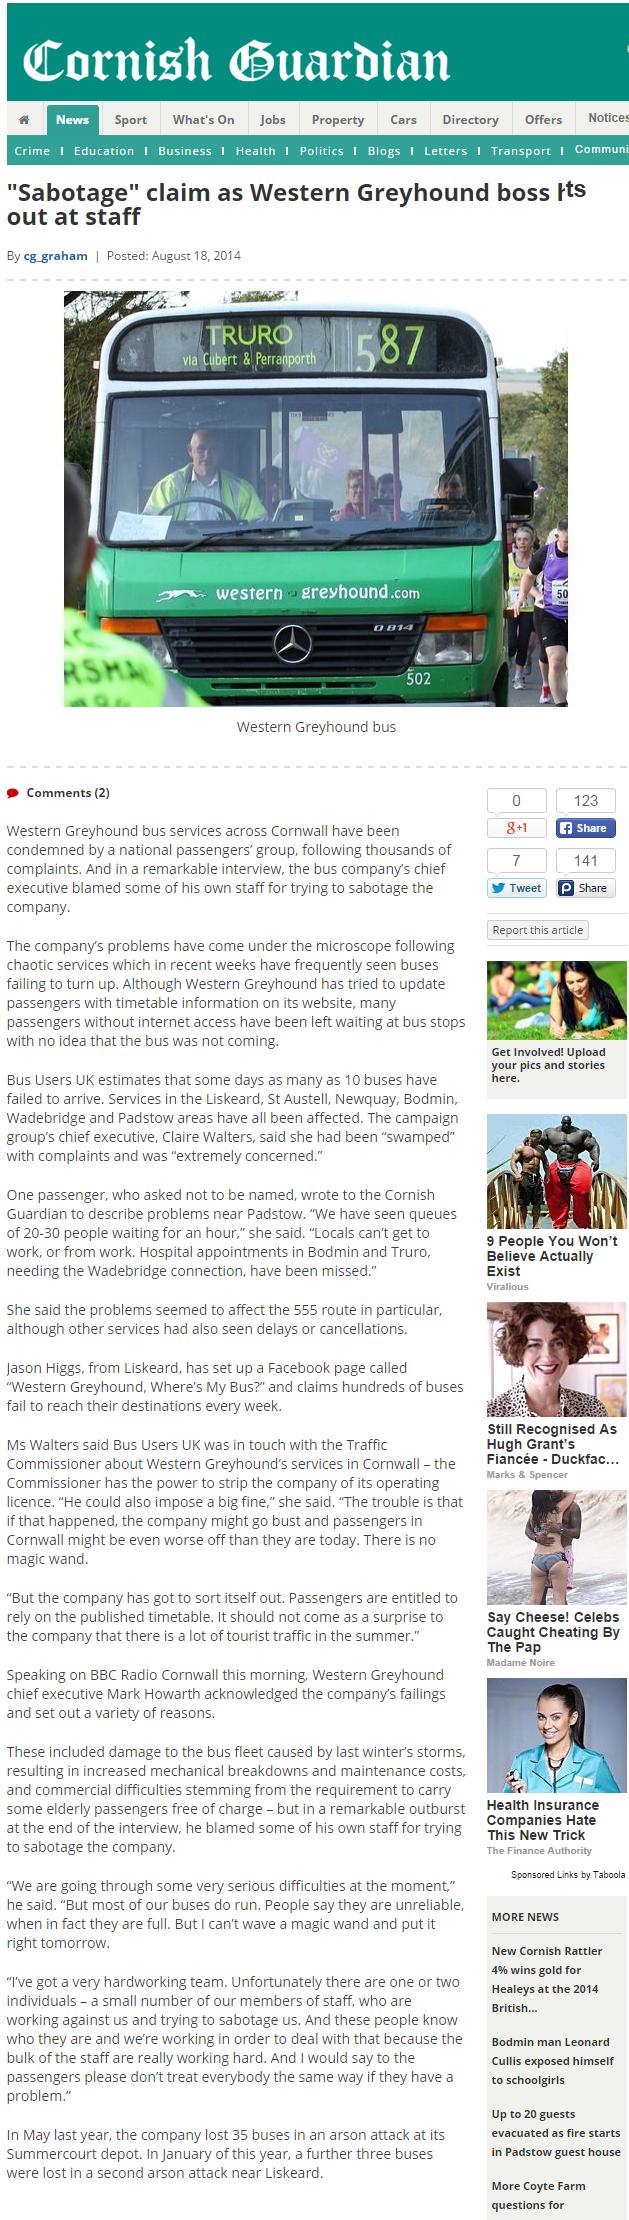 Sabotage  claim as Western Greyhound boss hits out at staff   Cornish Guardian